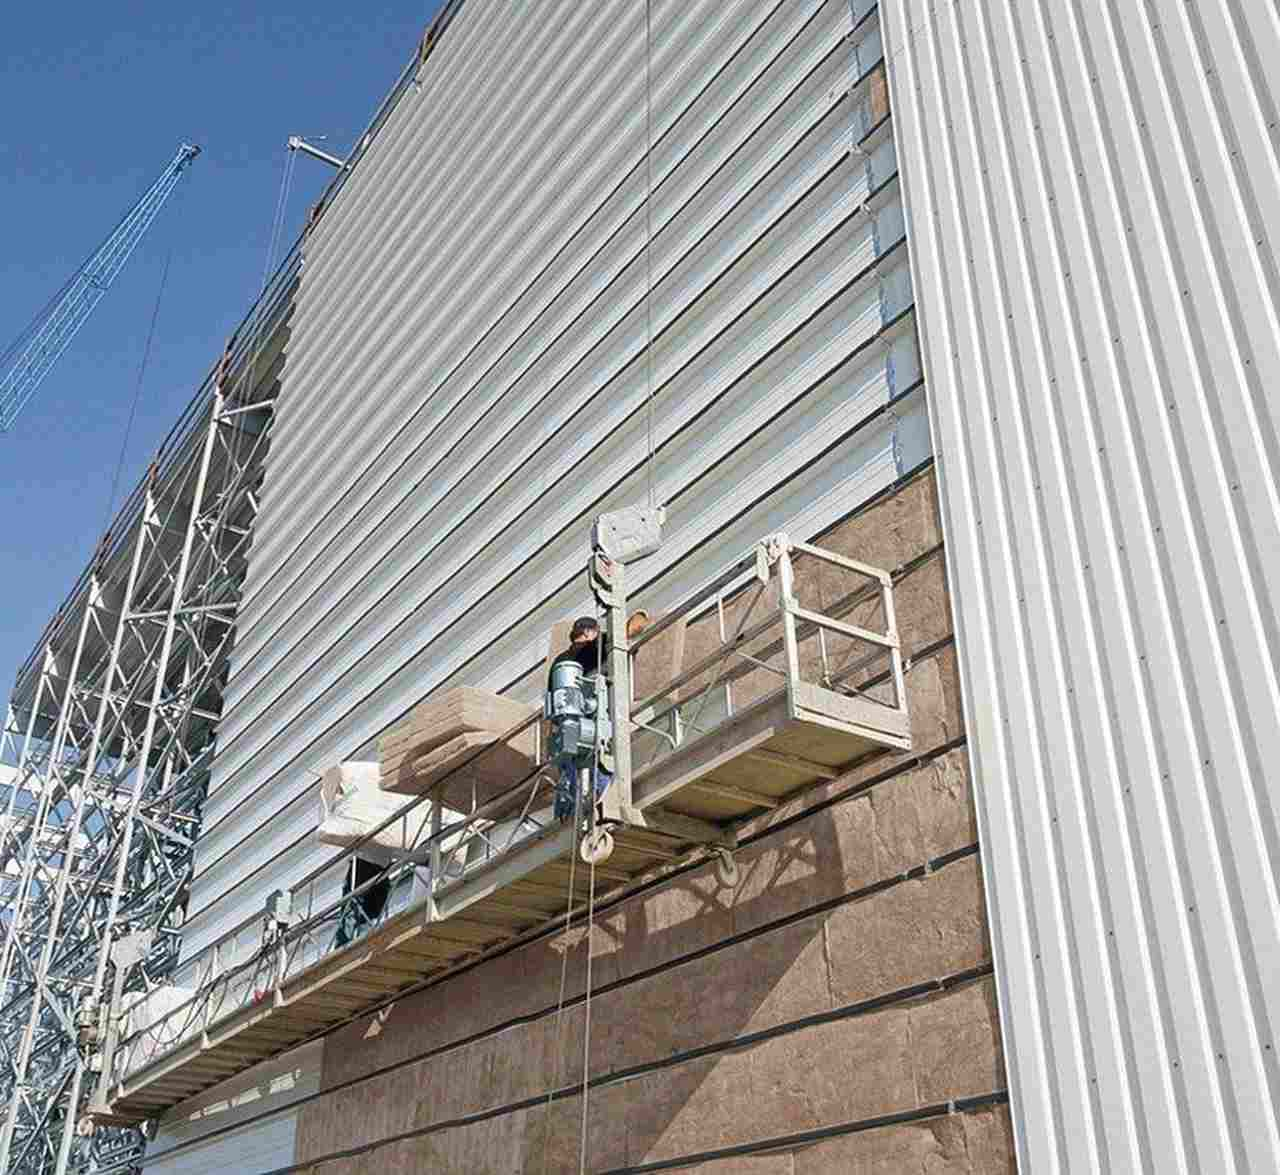 bba0818KnaufInsulation_Industriefassade.jpg